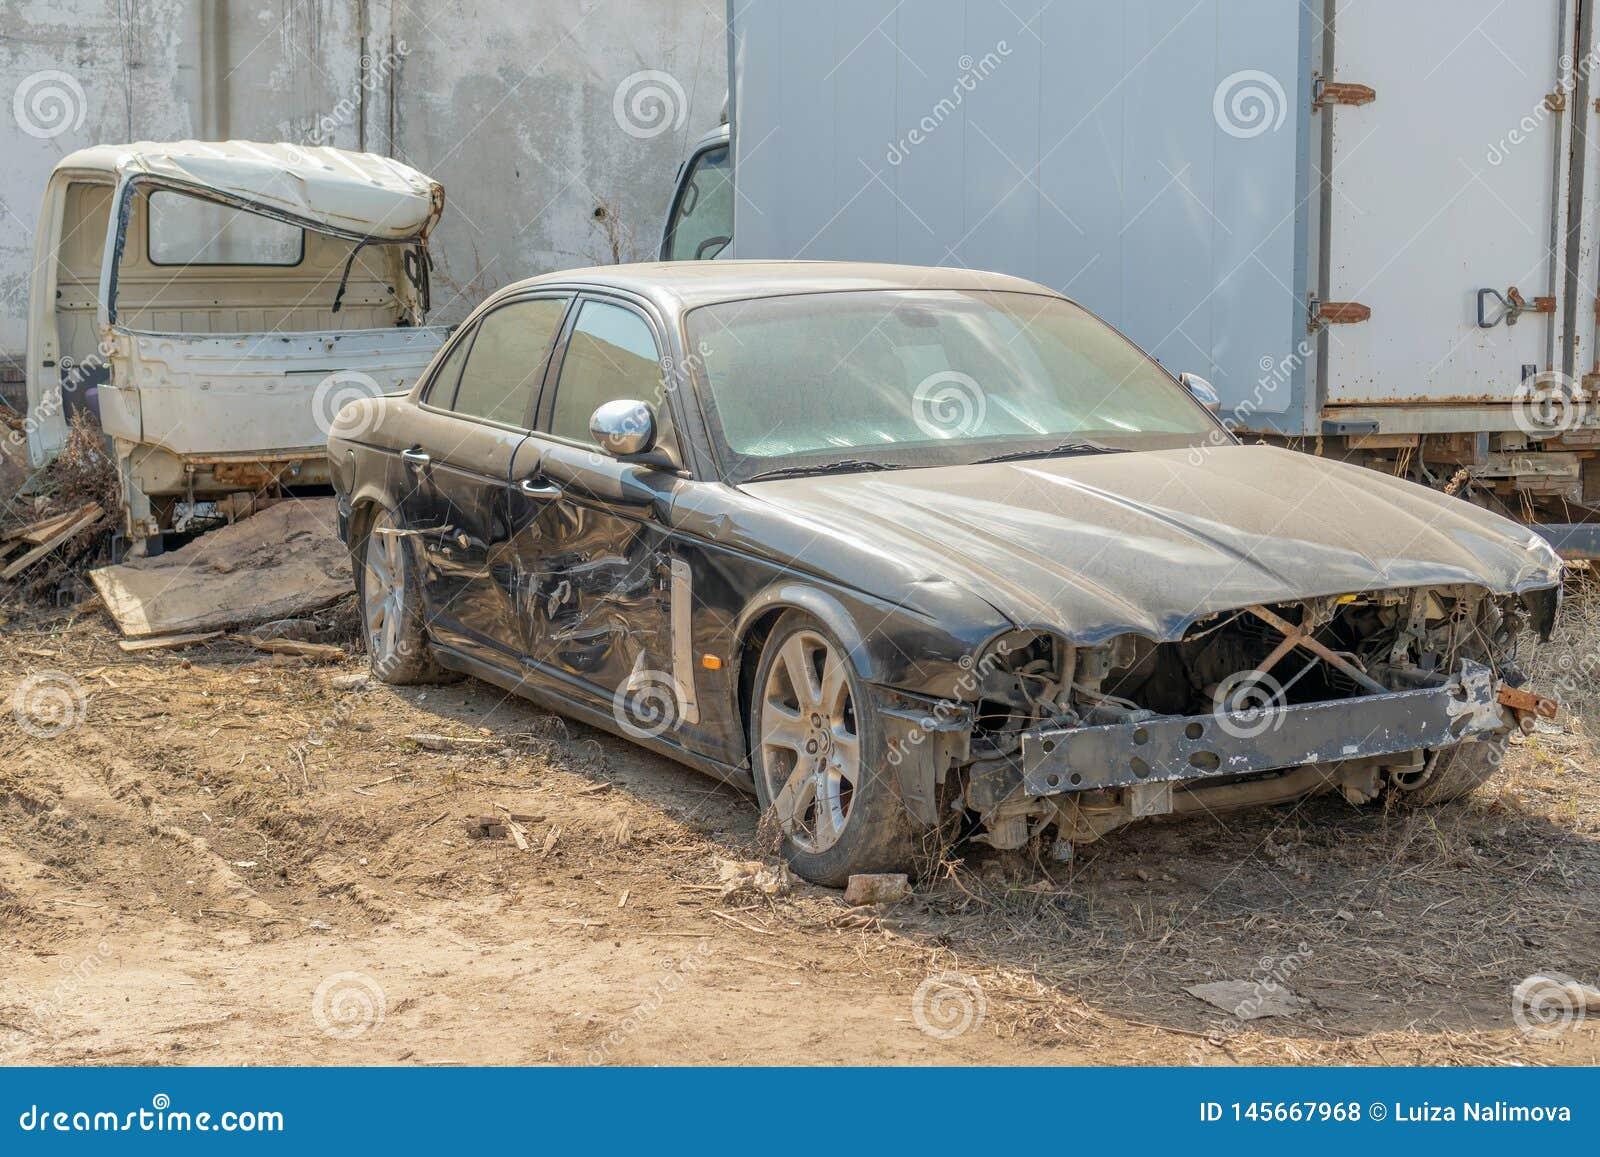 Russia, Kazan - April 20, 2019: Abandoned black Jaguar.